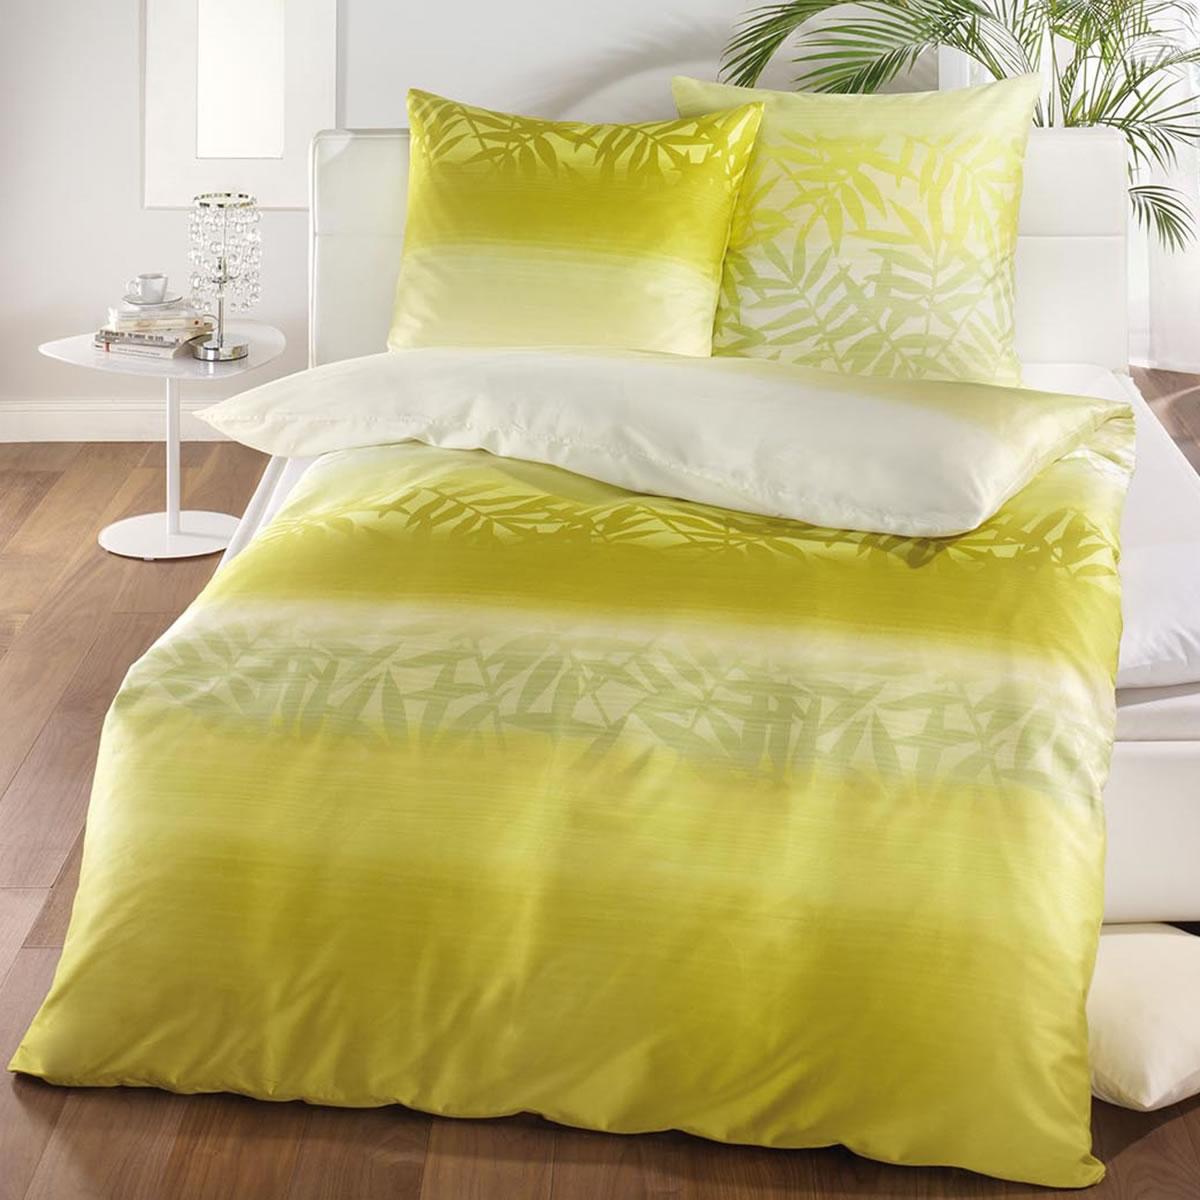 kaeppel mako satin bettw sche 135x200 cm sheer 6373 gr n natur farn. Black Bedroom Furniture Sets. Home Design Ideas